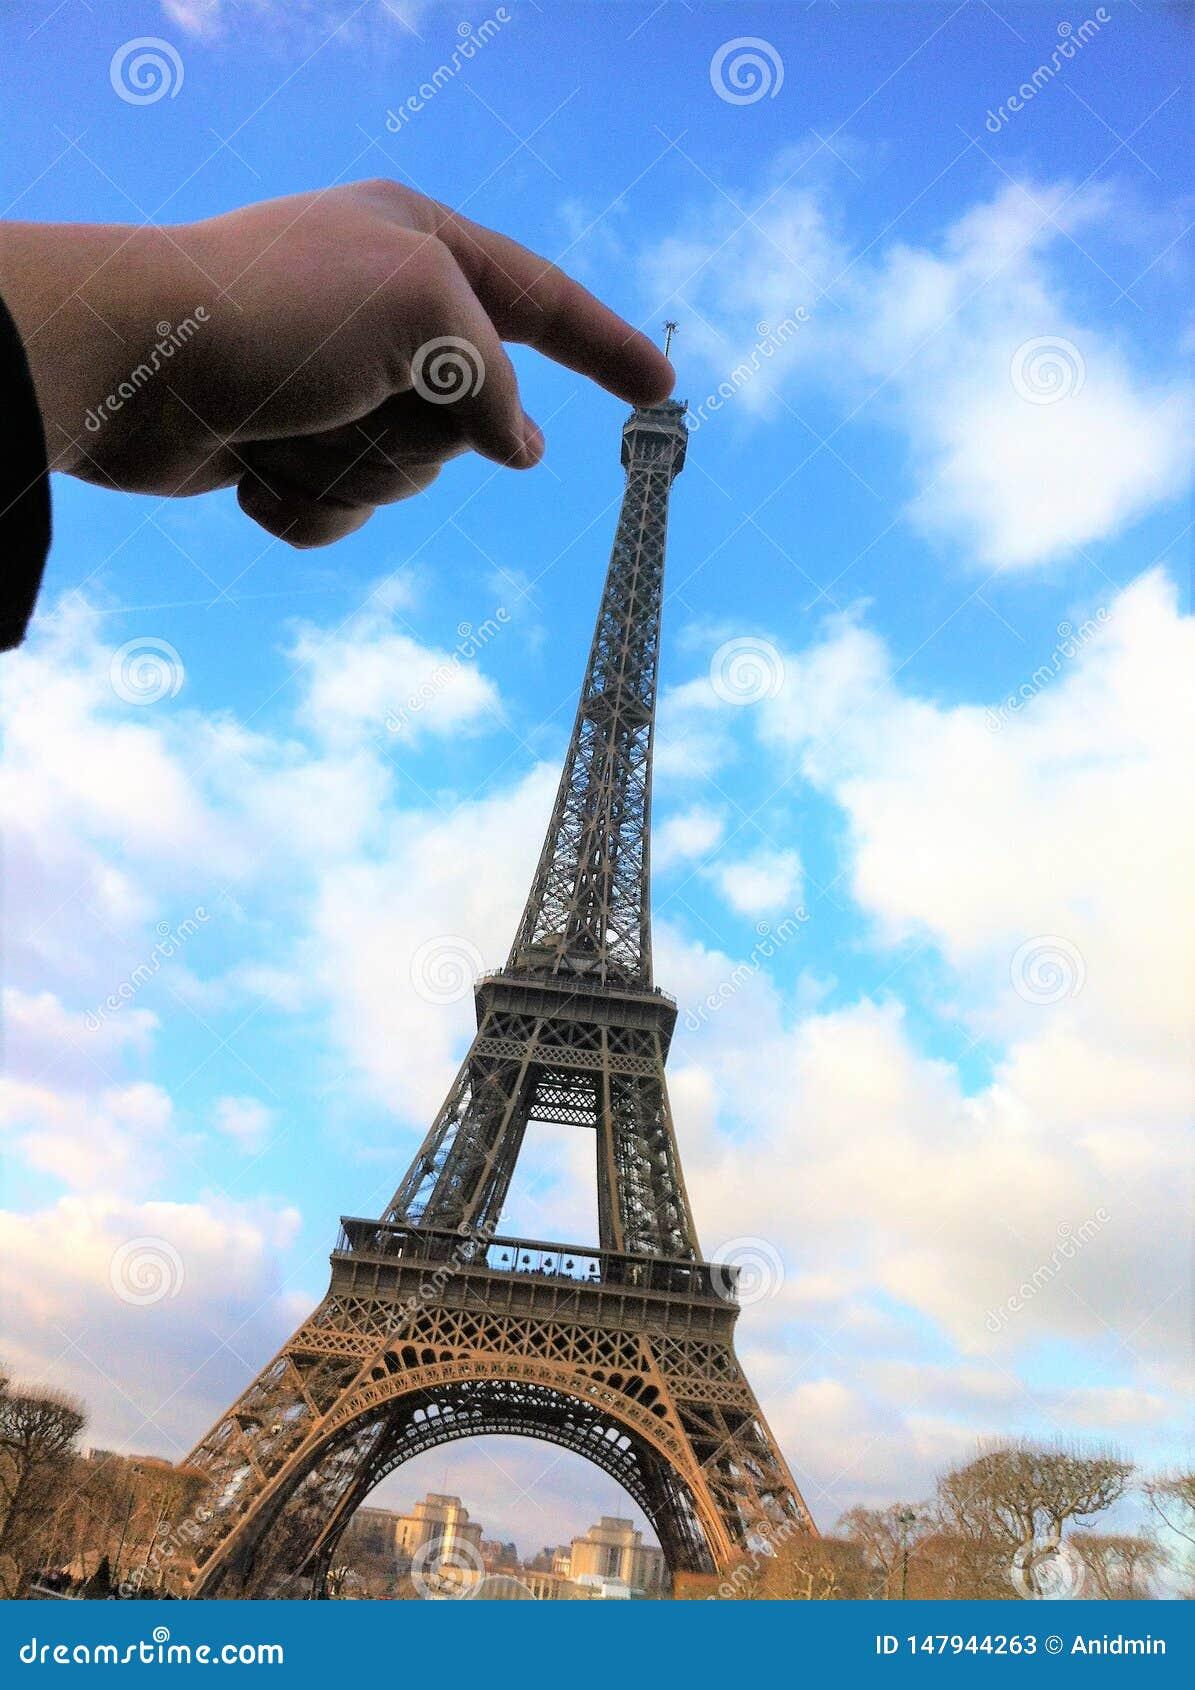 Parigi, Francia - 30 dicembre 2014: Torre Eiffel